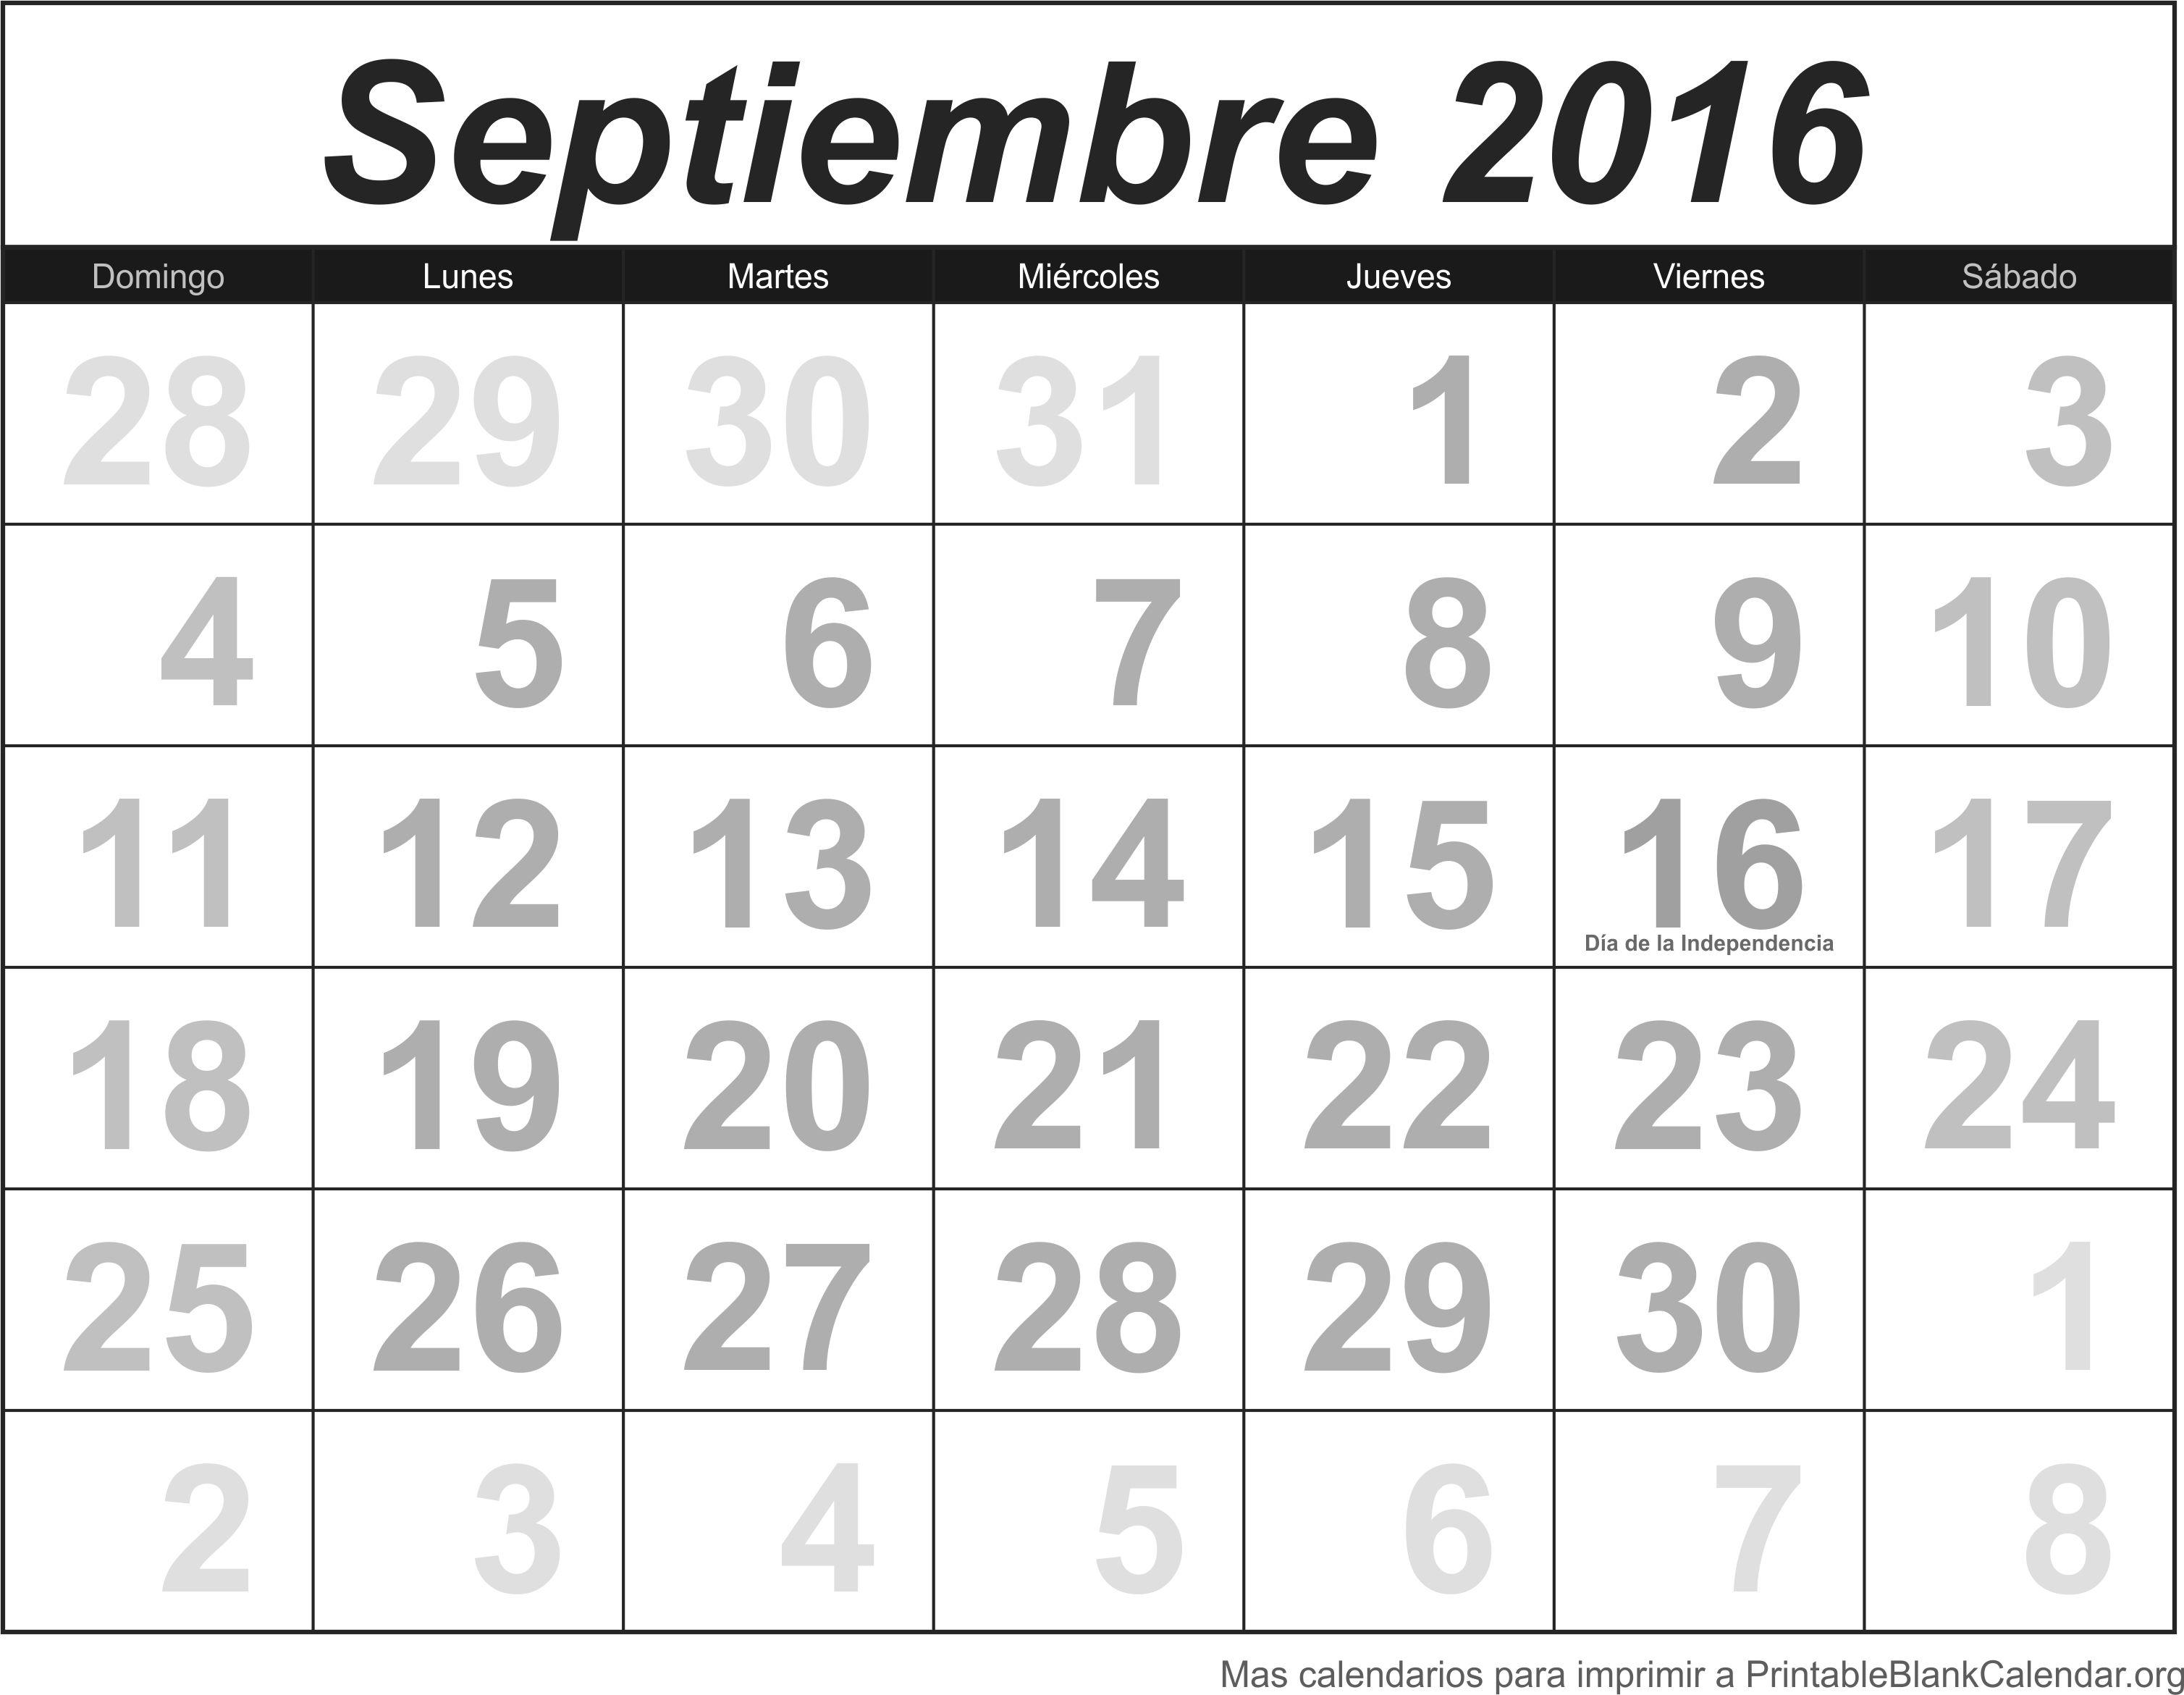 Septiembre 2016 Calendario para Imprimir - Calendarios Para Imprimir